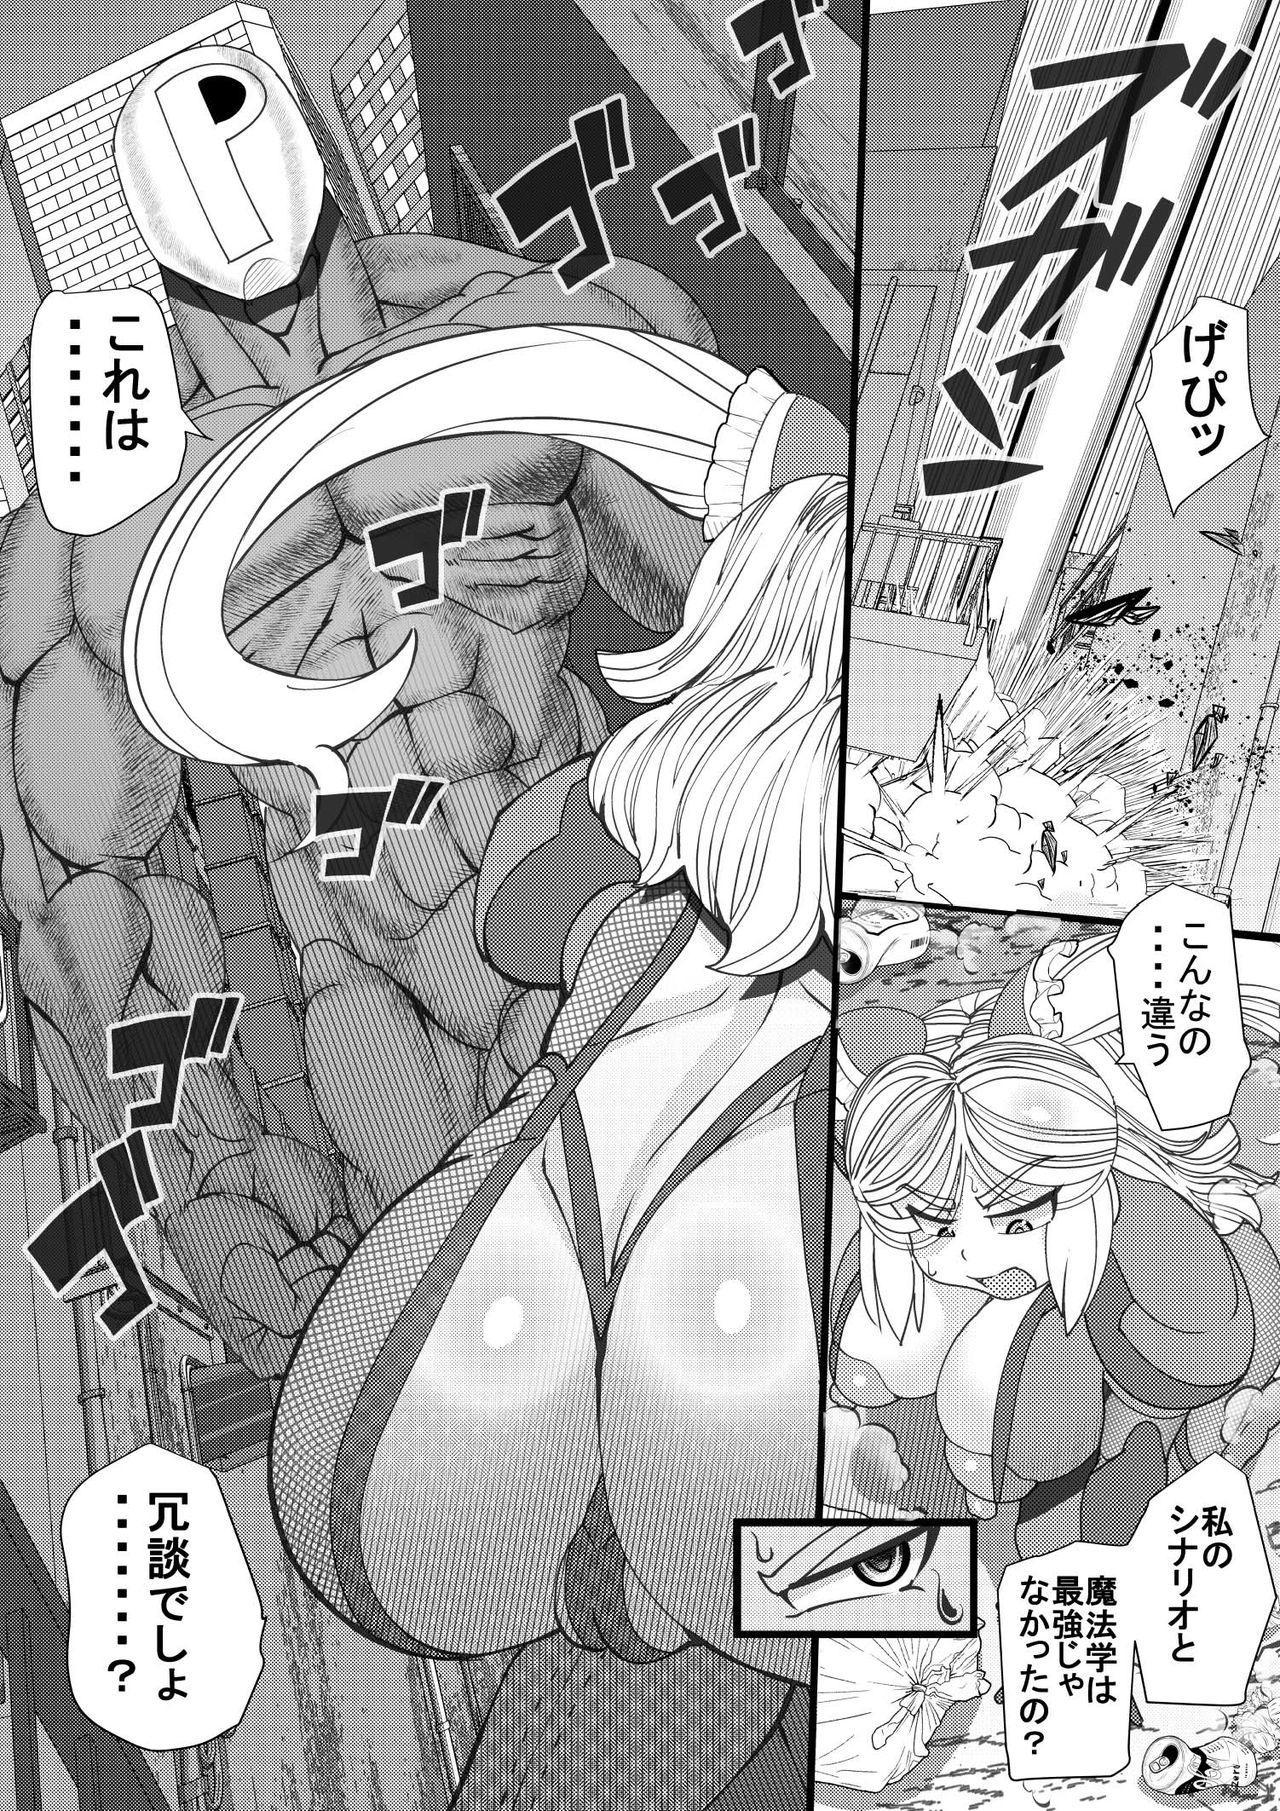 Haramachi 9 6